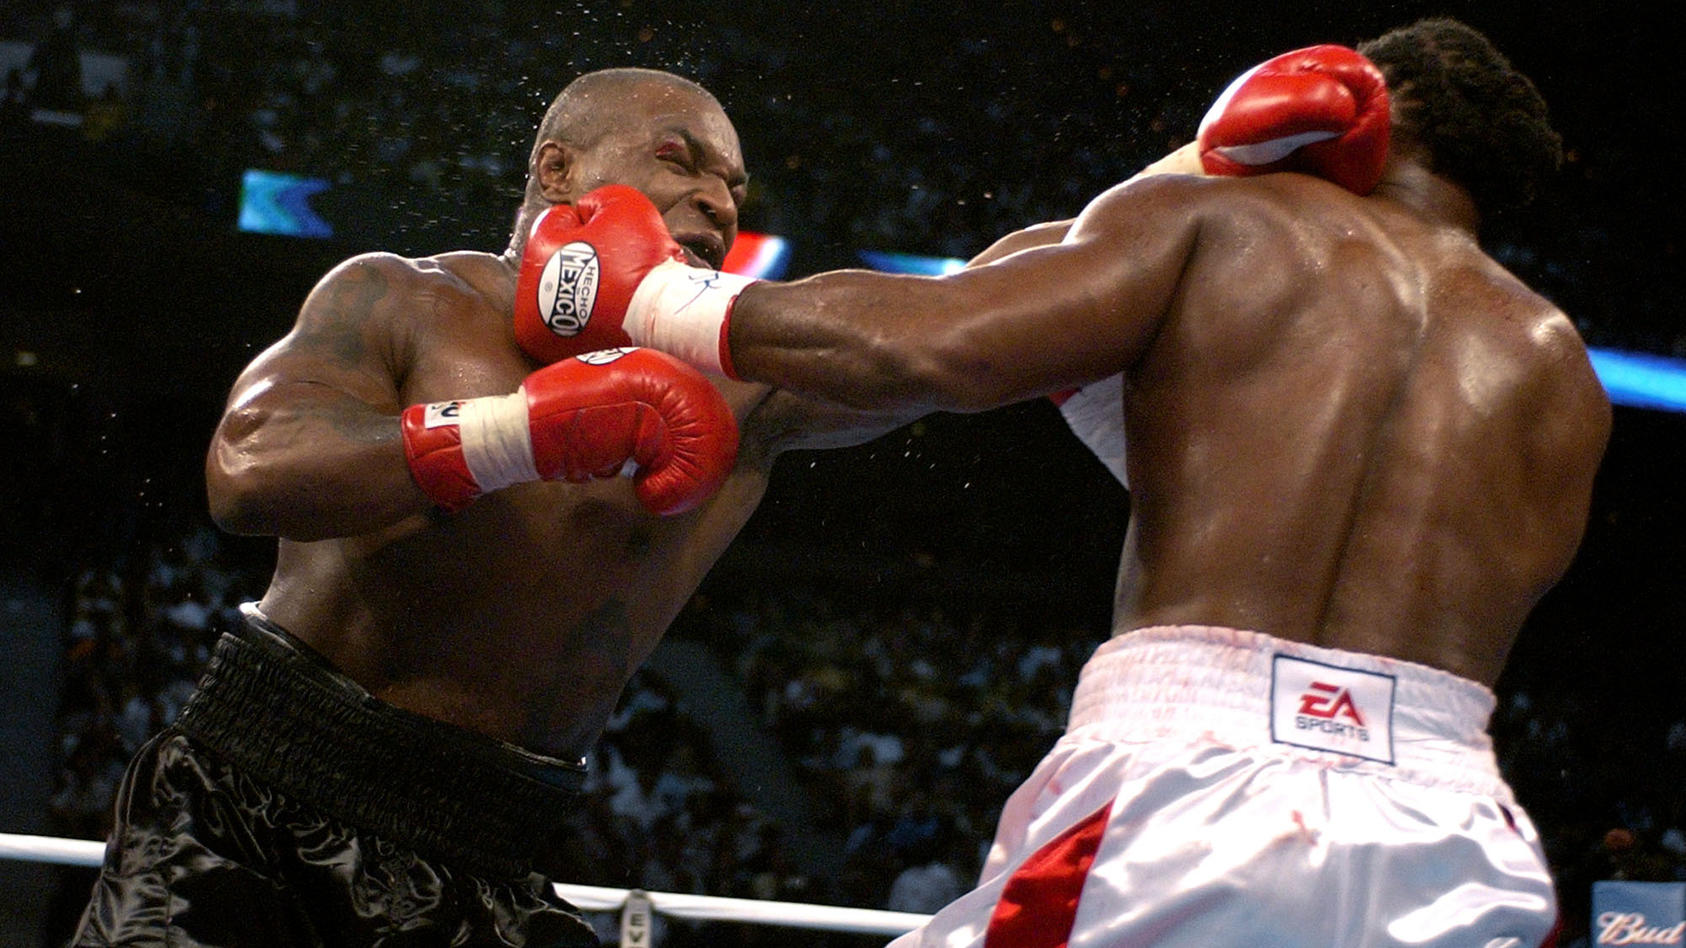 Tyson vs. Lewis